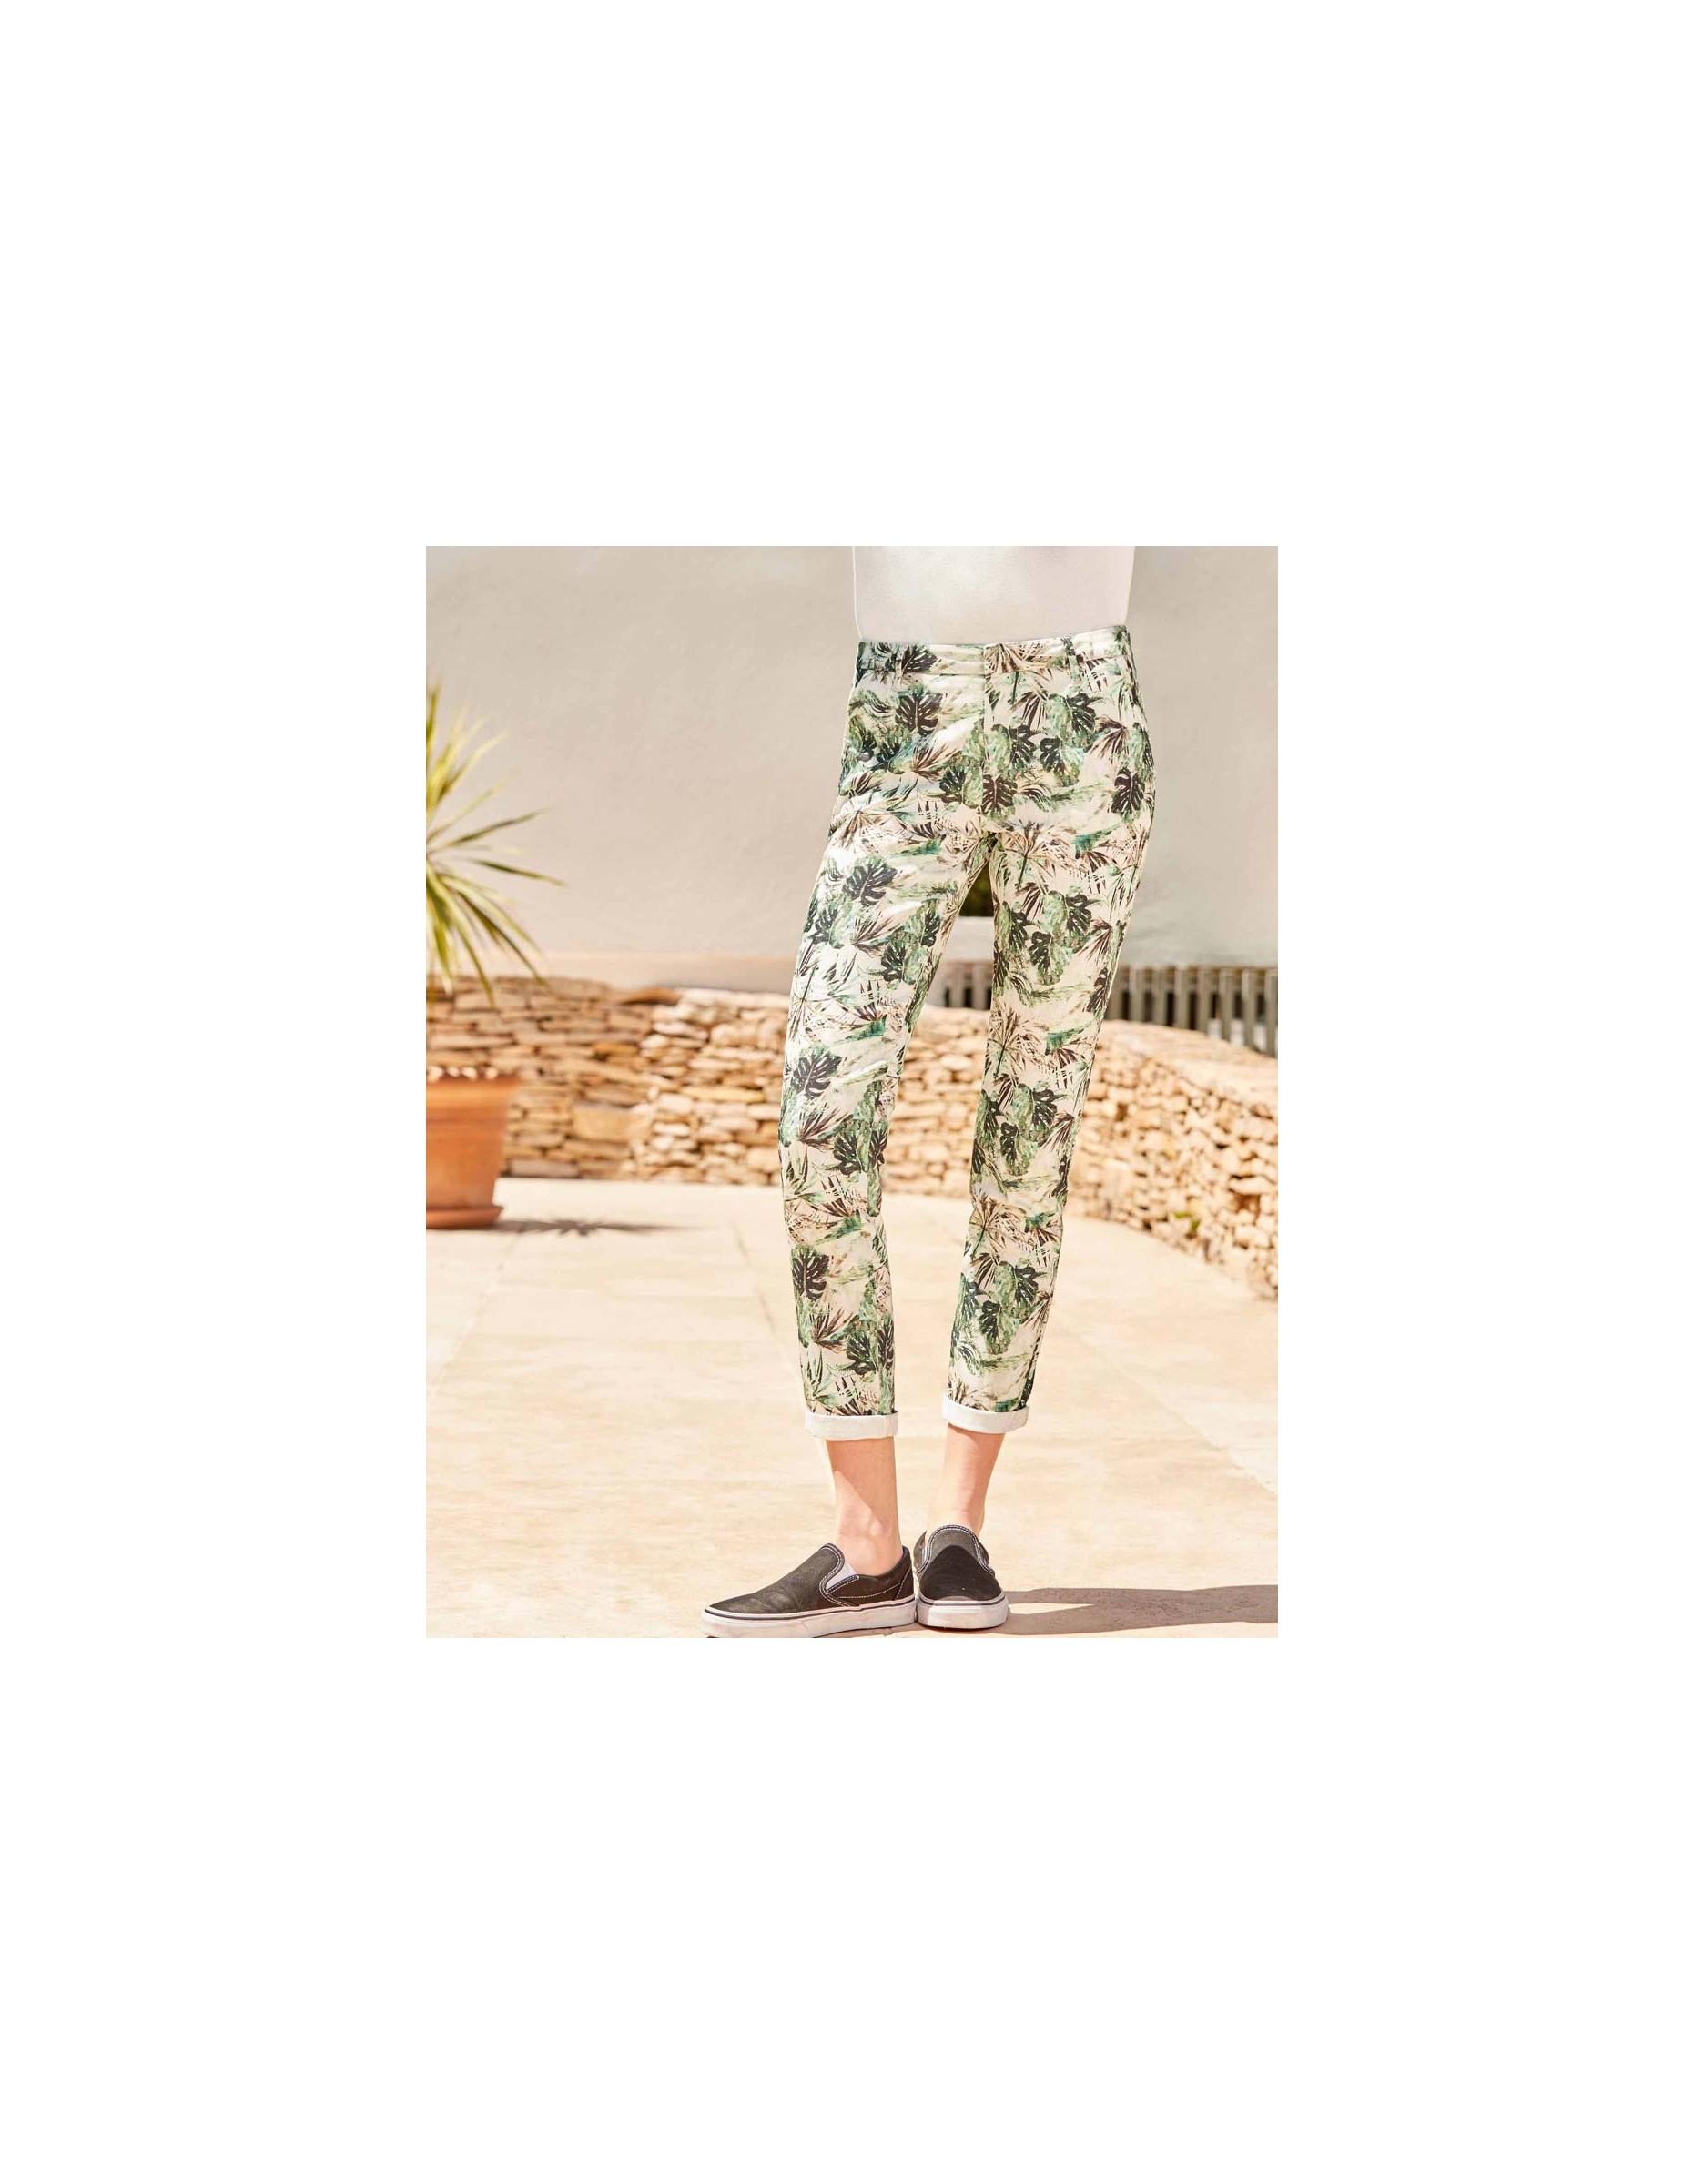 Sandy Pantalon Palm Reiko Skinny Printed Green Chino Femme W9IEDH2